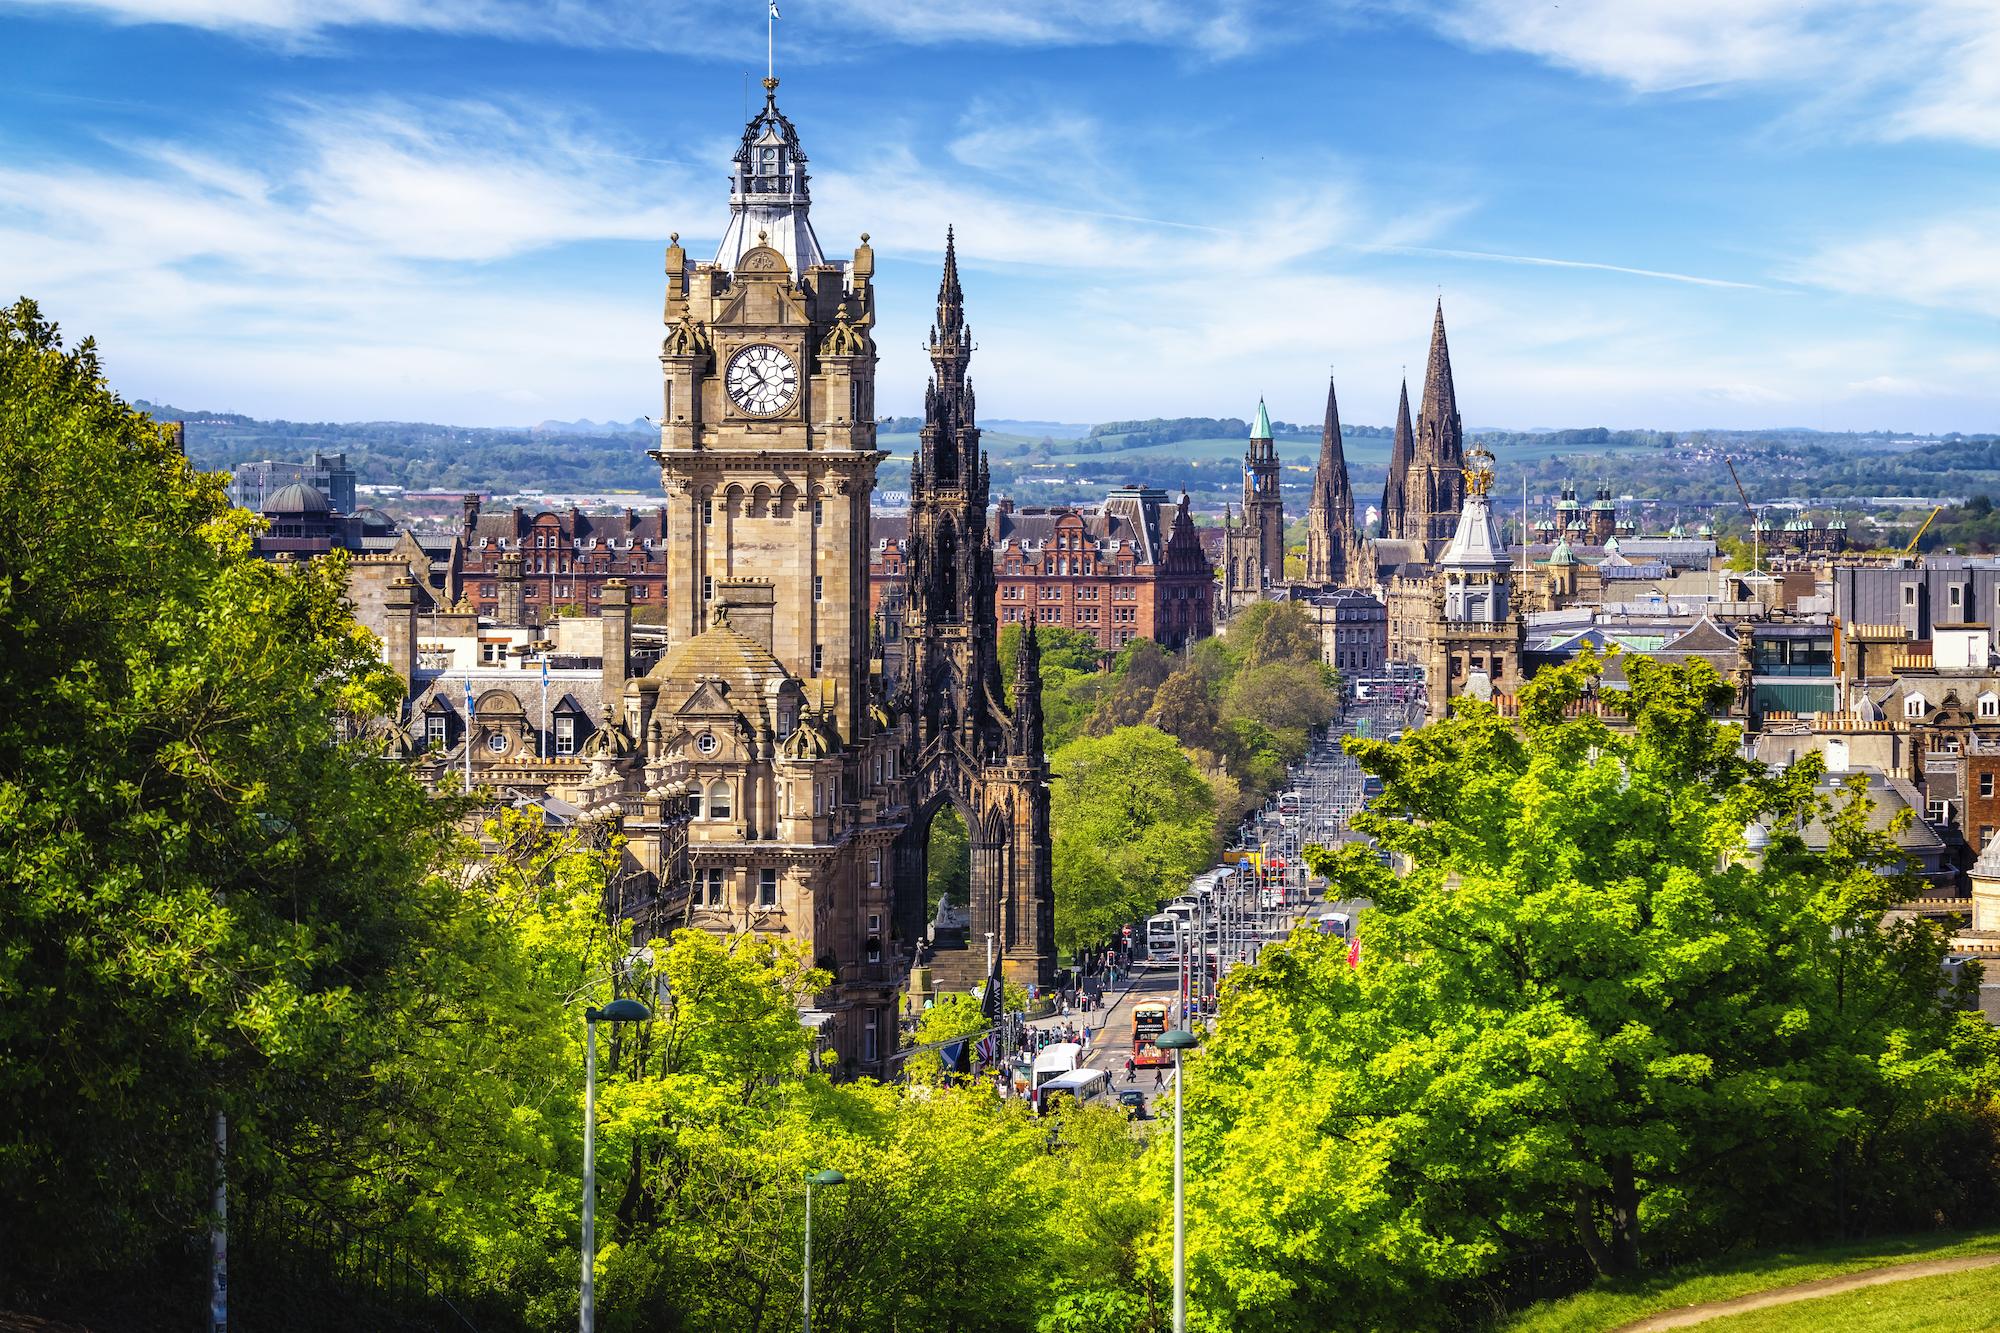 View of churches in Edinburgh, Scotland